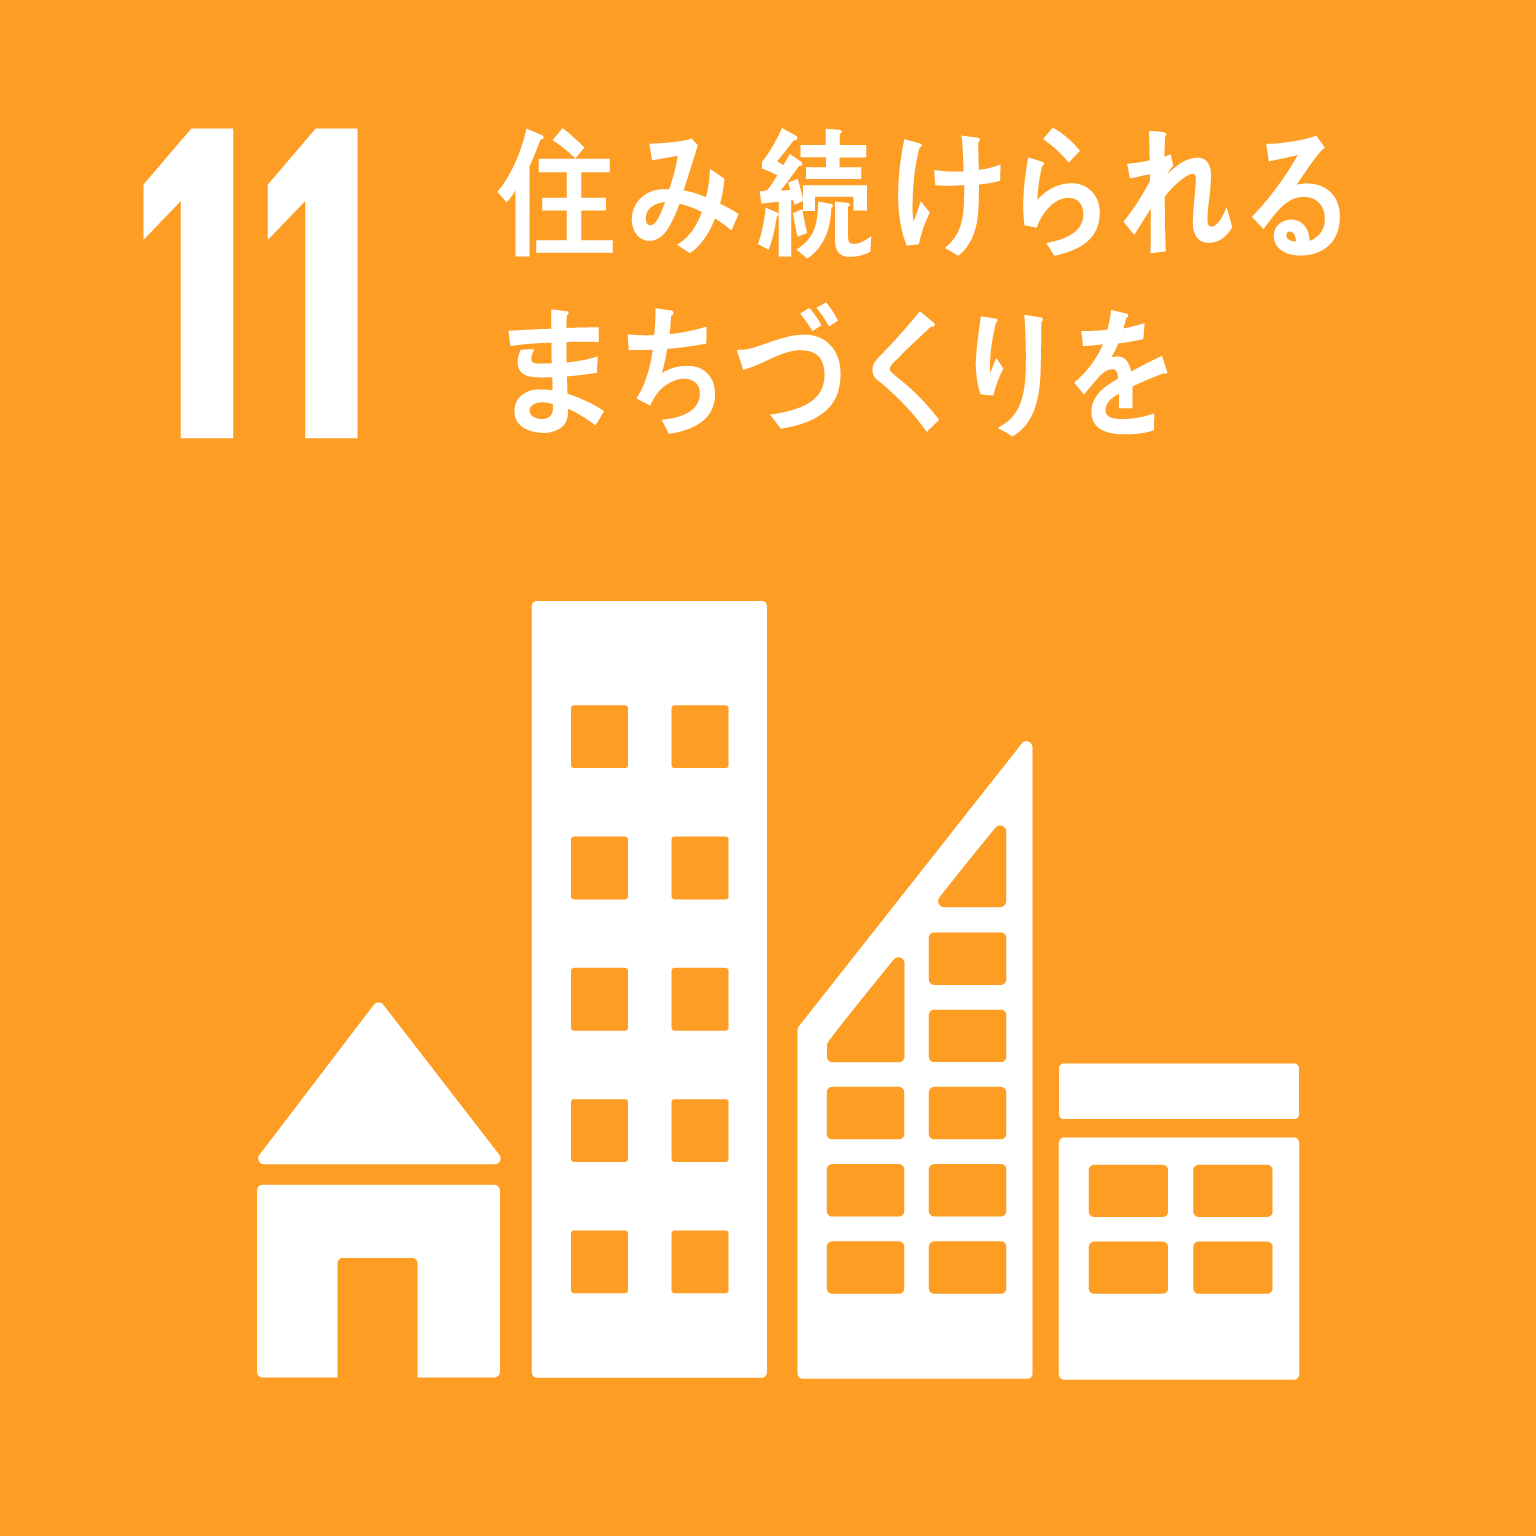 https://www.unic.or.jp/files/sdg_icon_11_ja.png